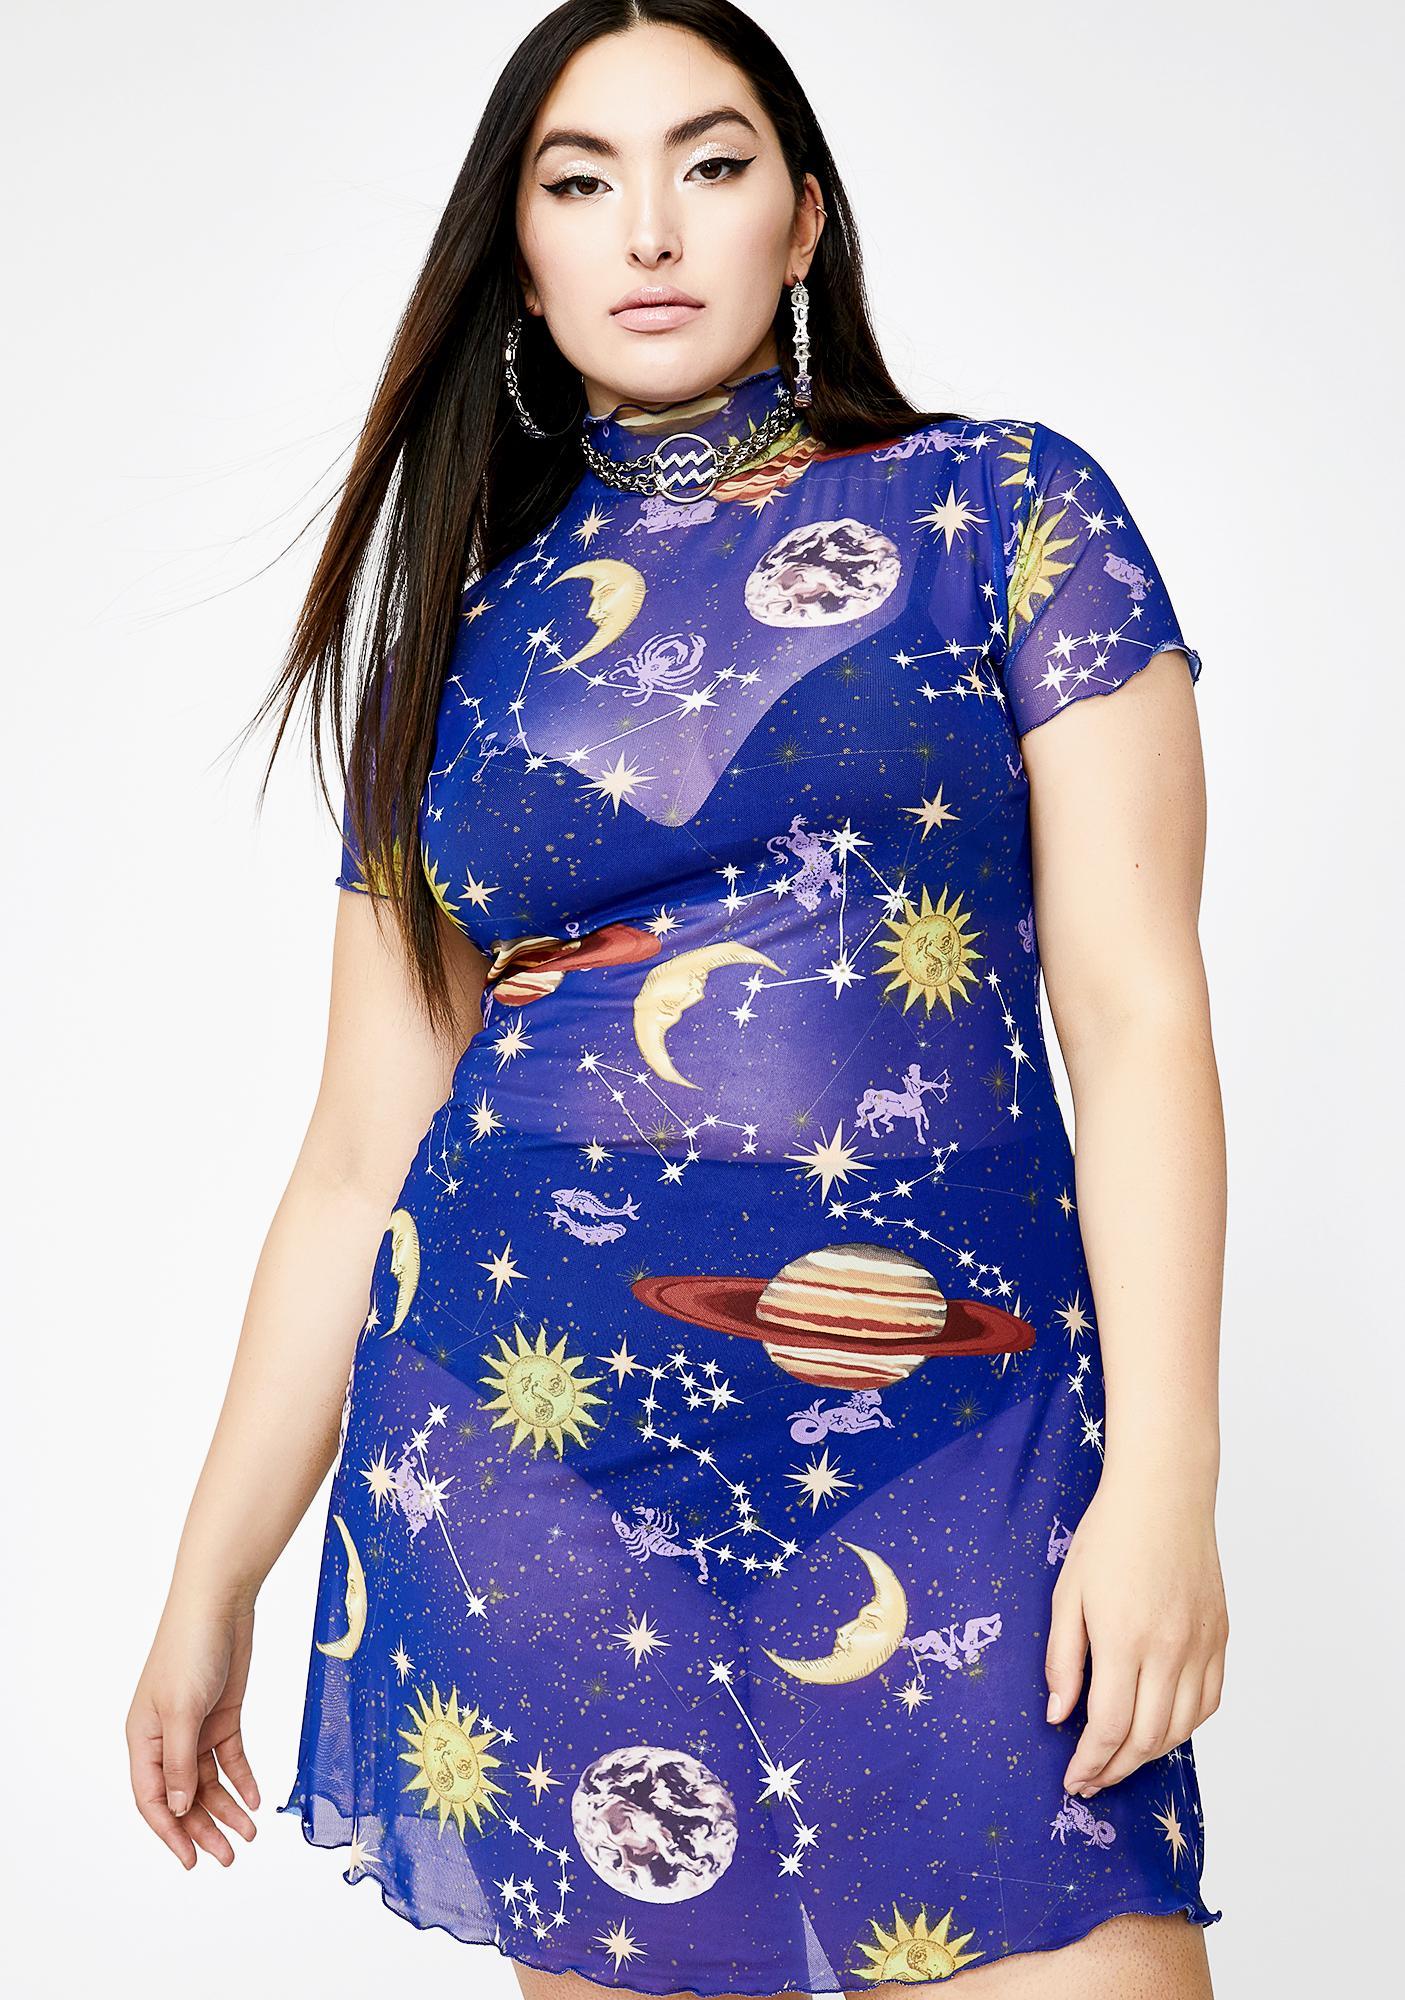 HOROSCOPEZ Dreamy Astro World Mesh Dress